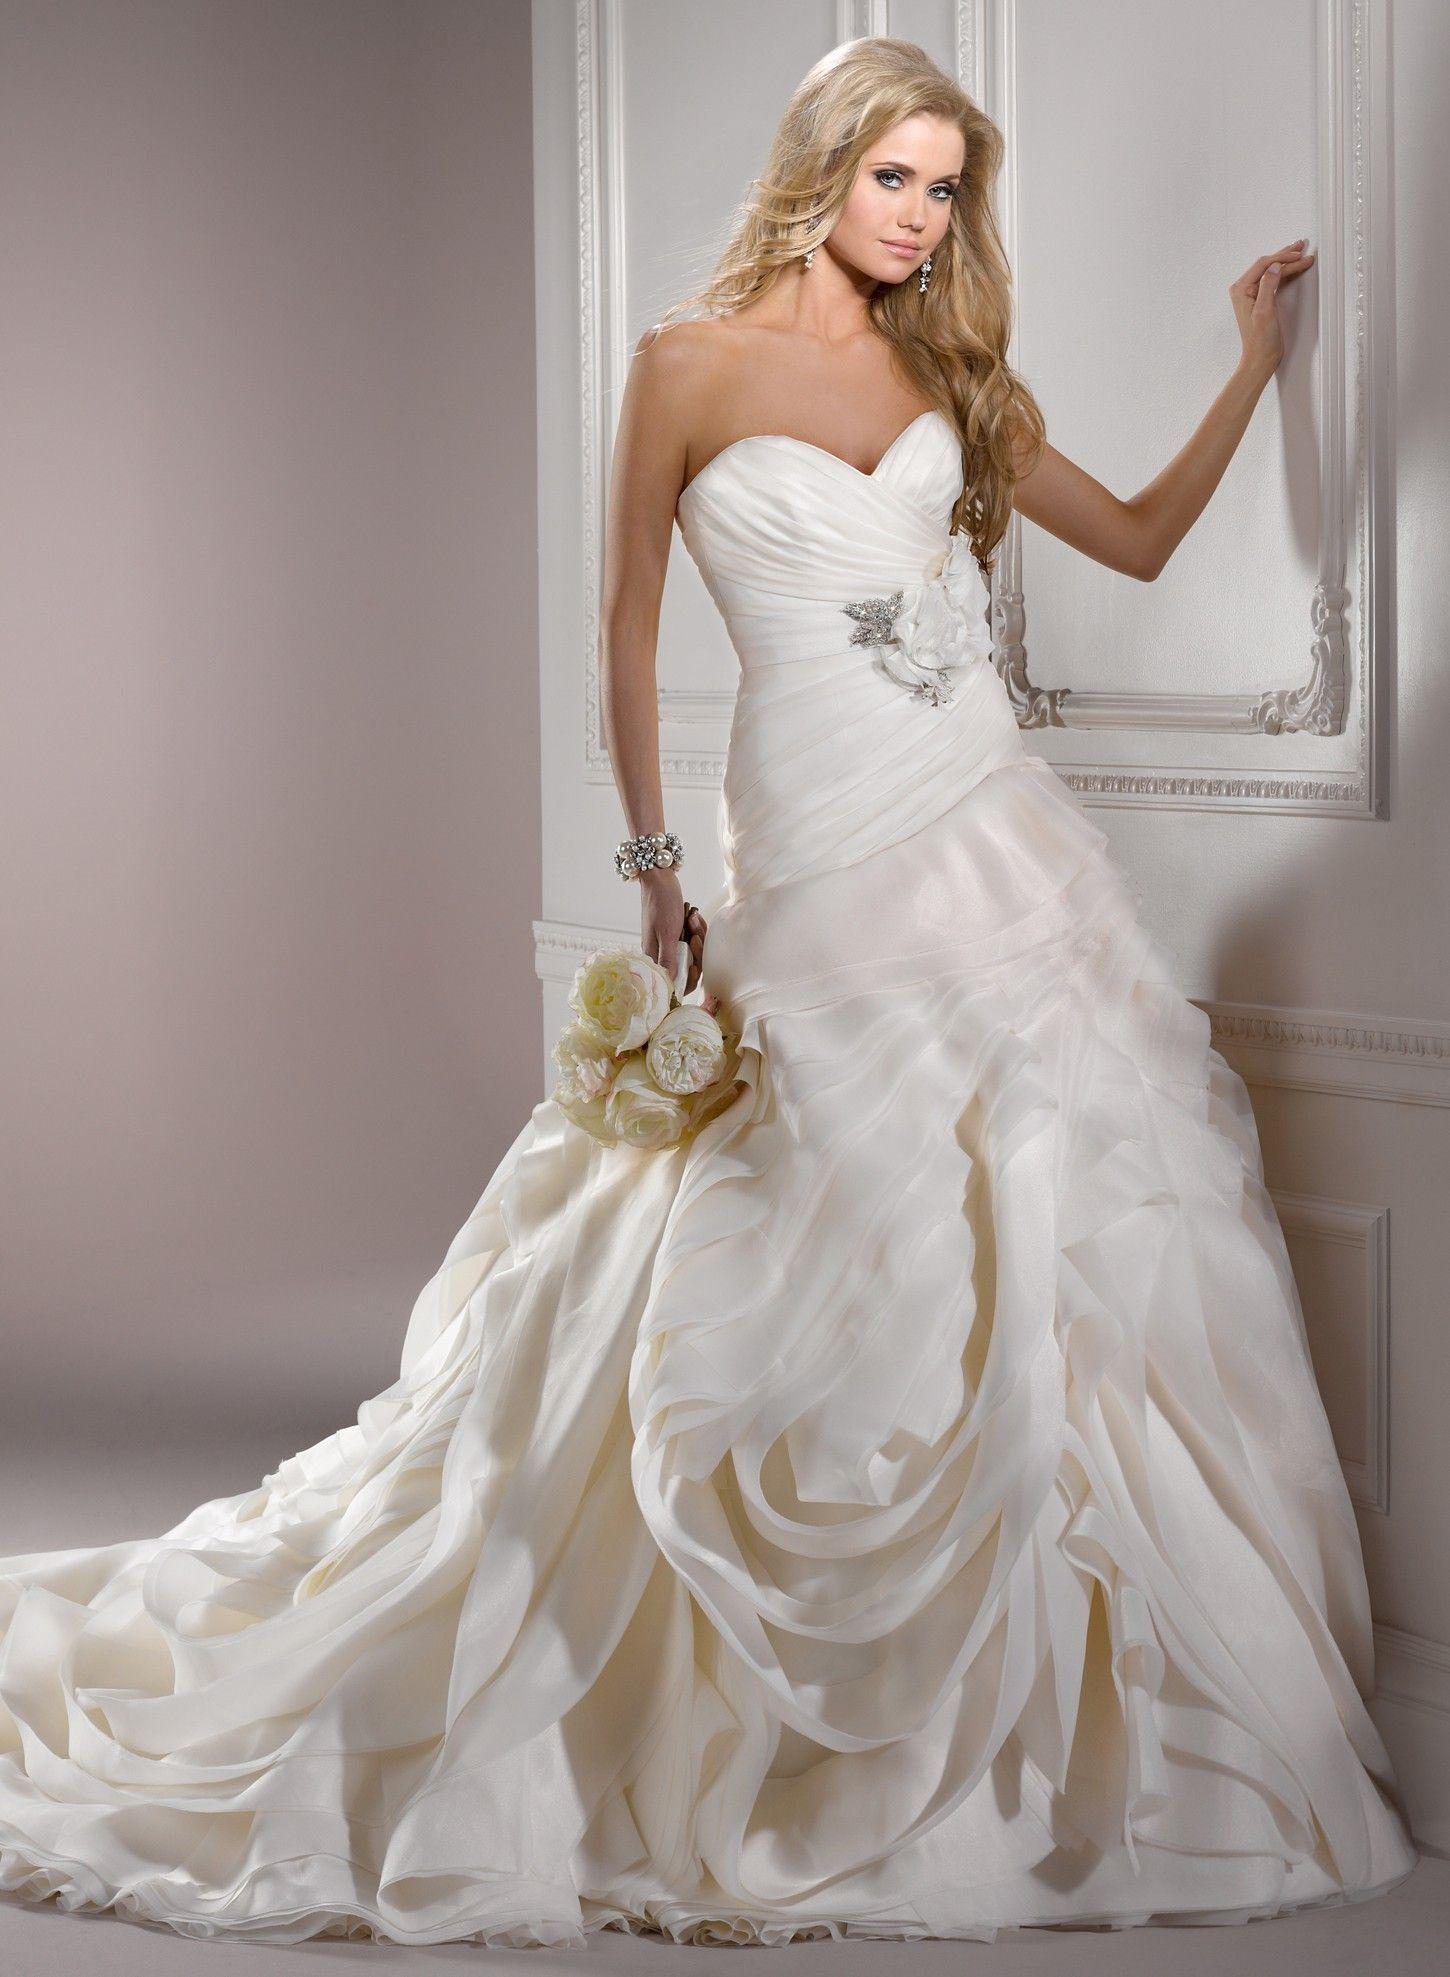 Wedding dress runaway bride  black organza sweetheart neckline dress  Google Search